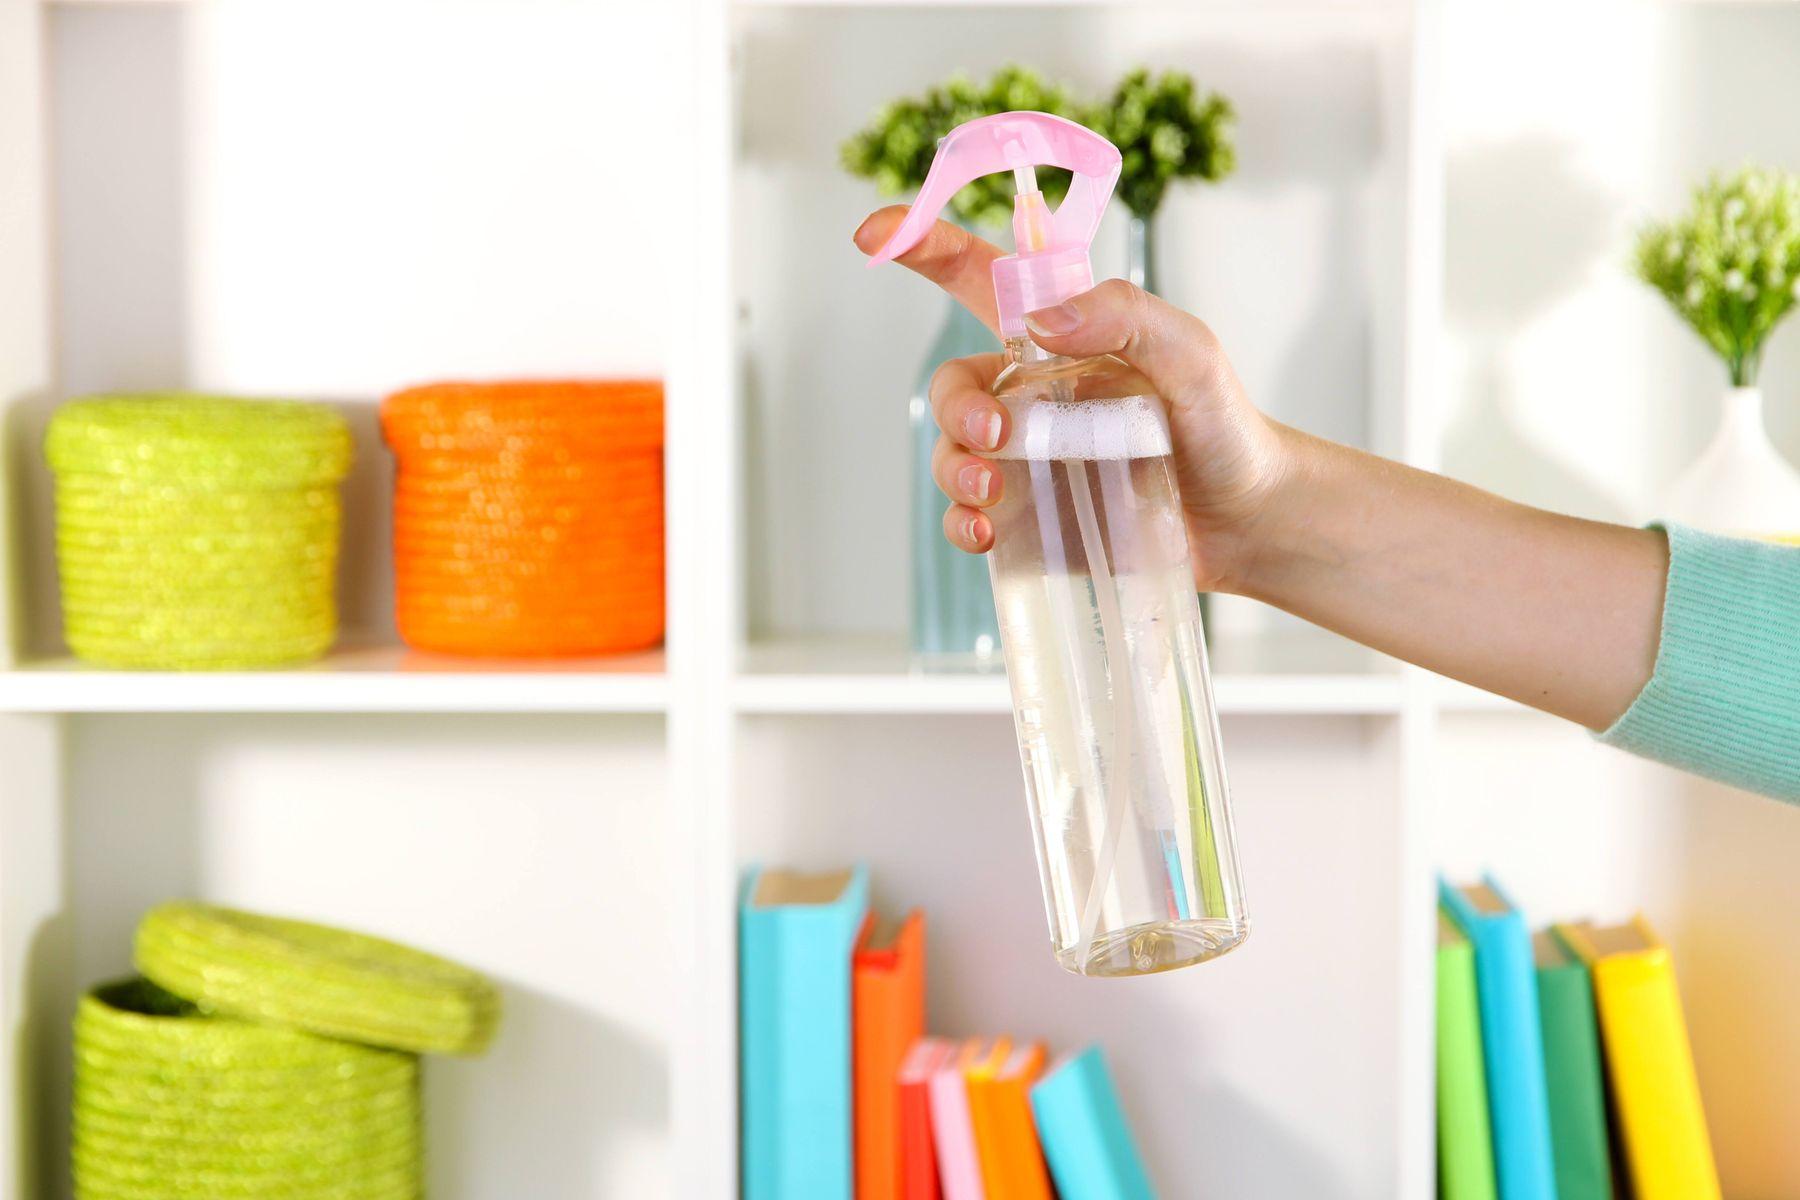 bottle of air freshener in home